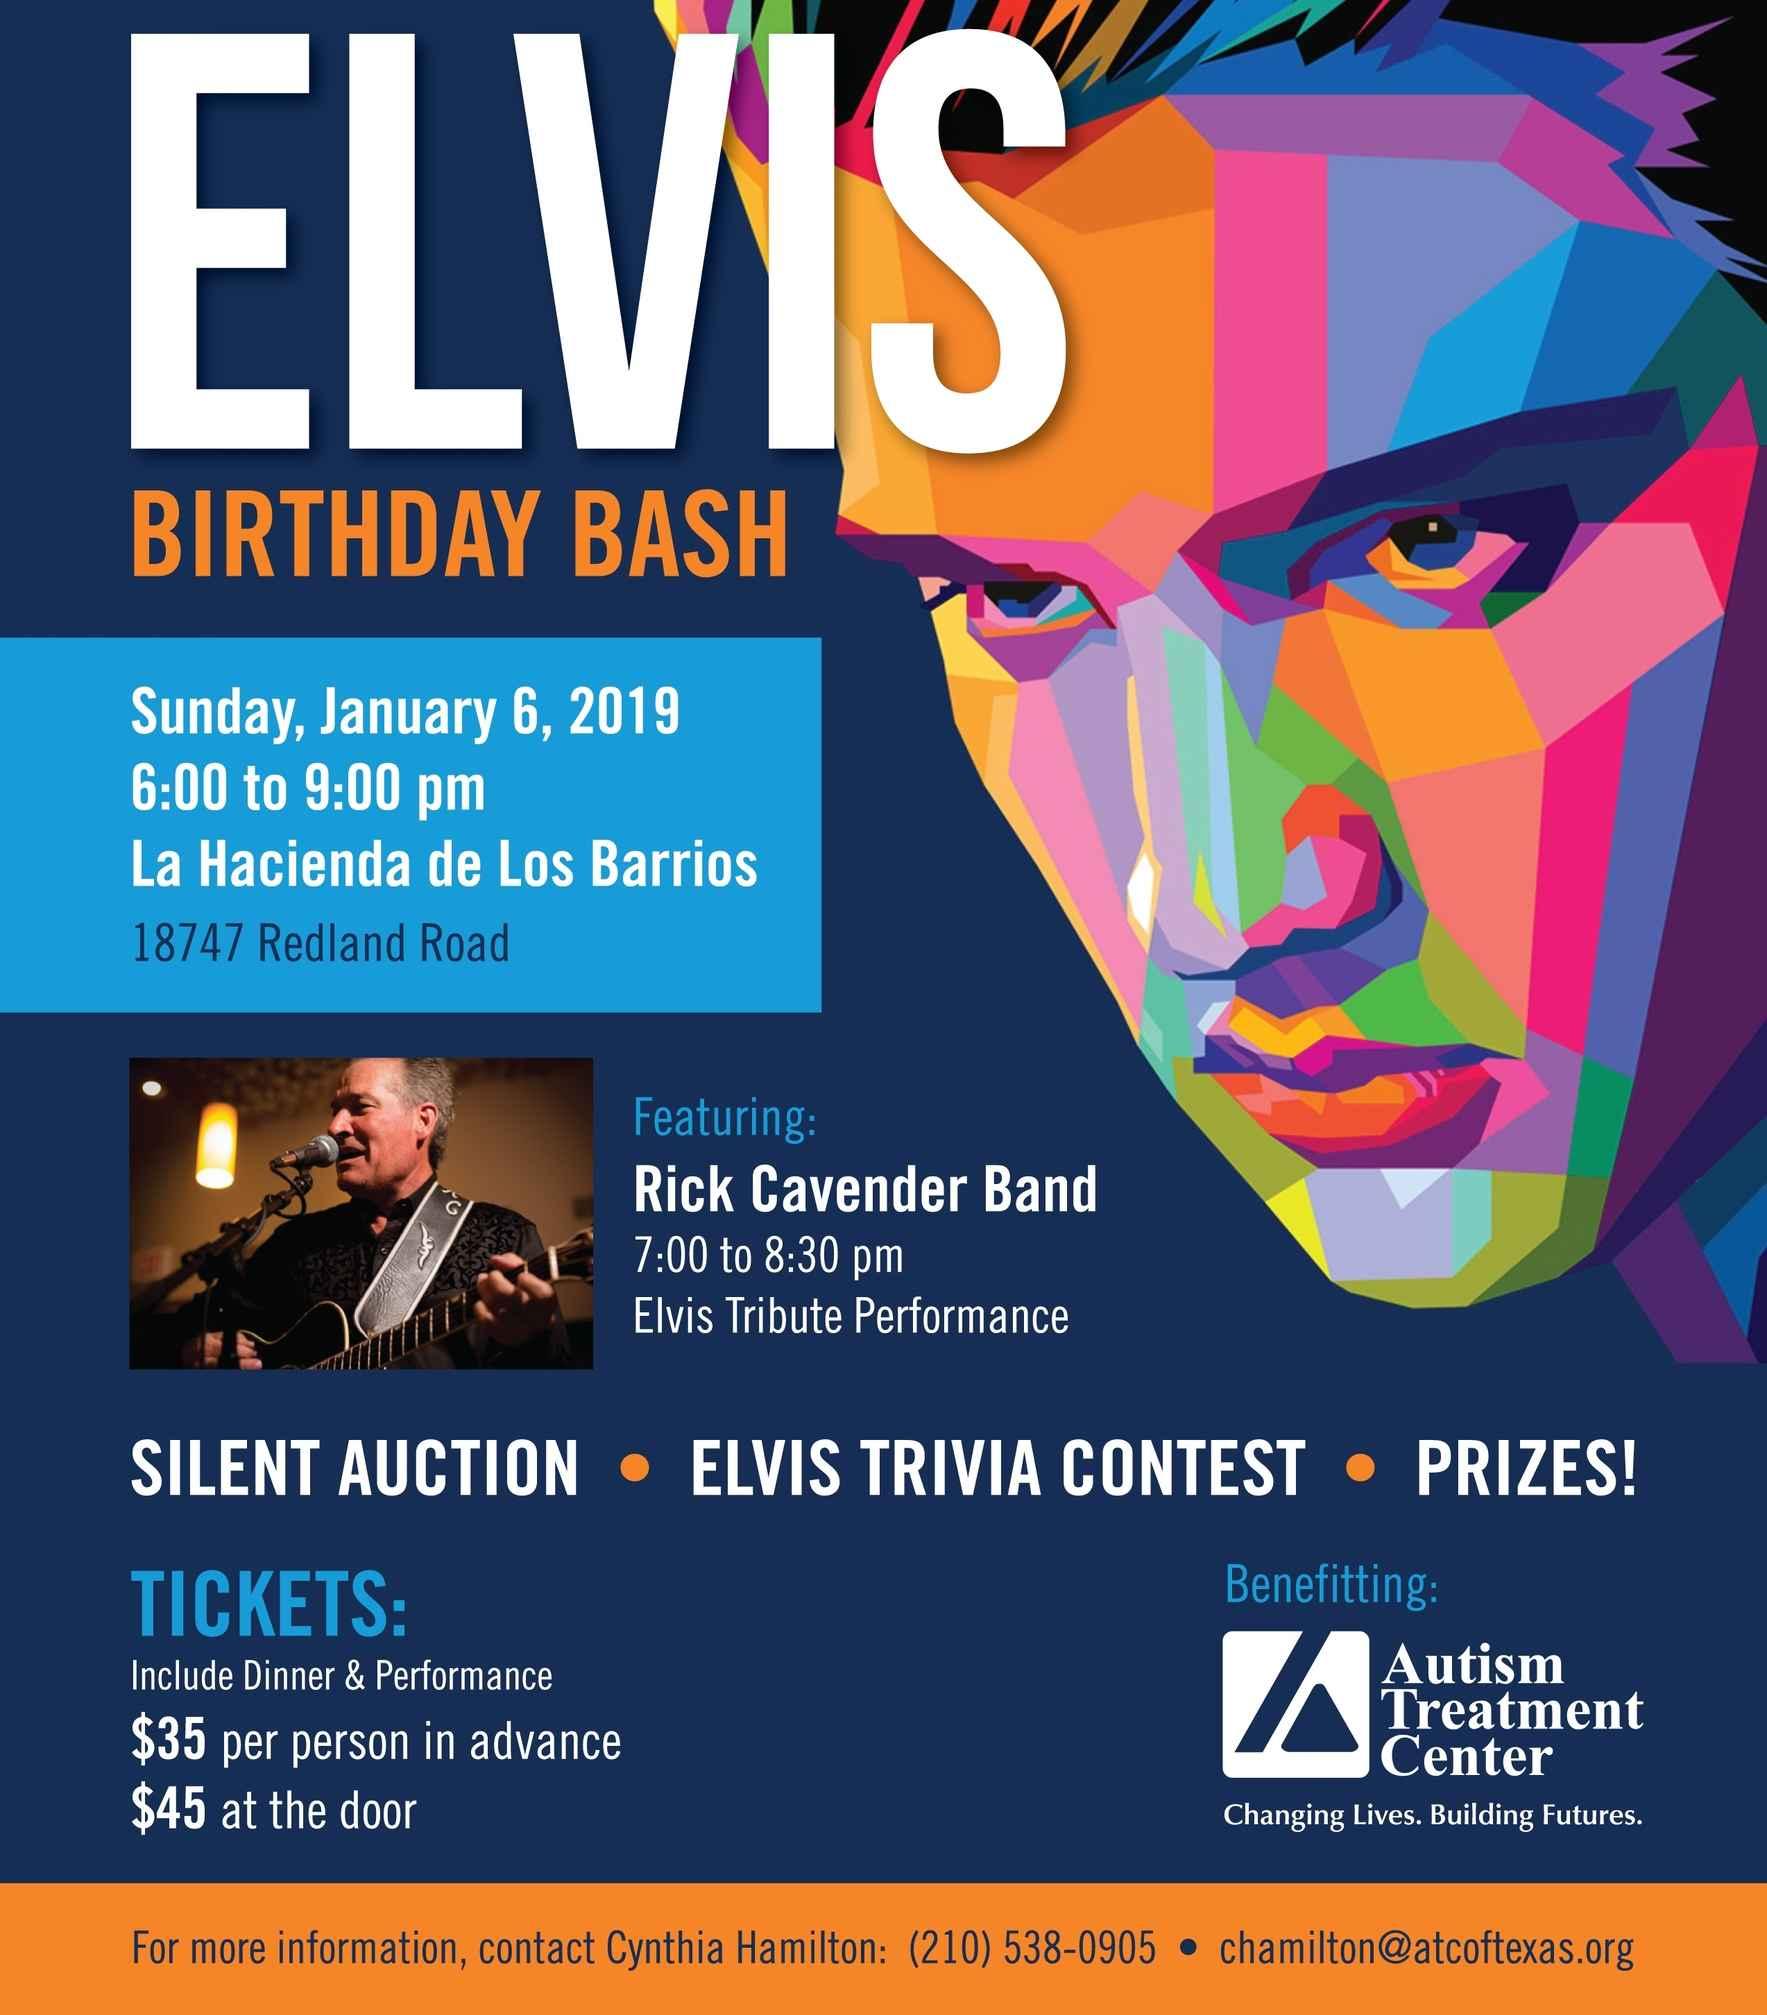 Elvis Birthday Bash image